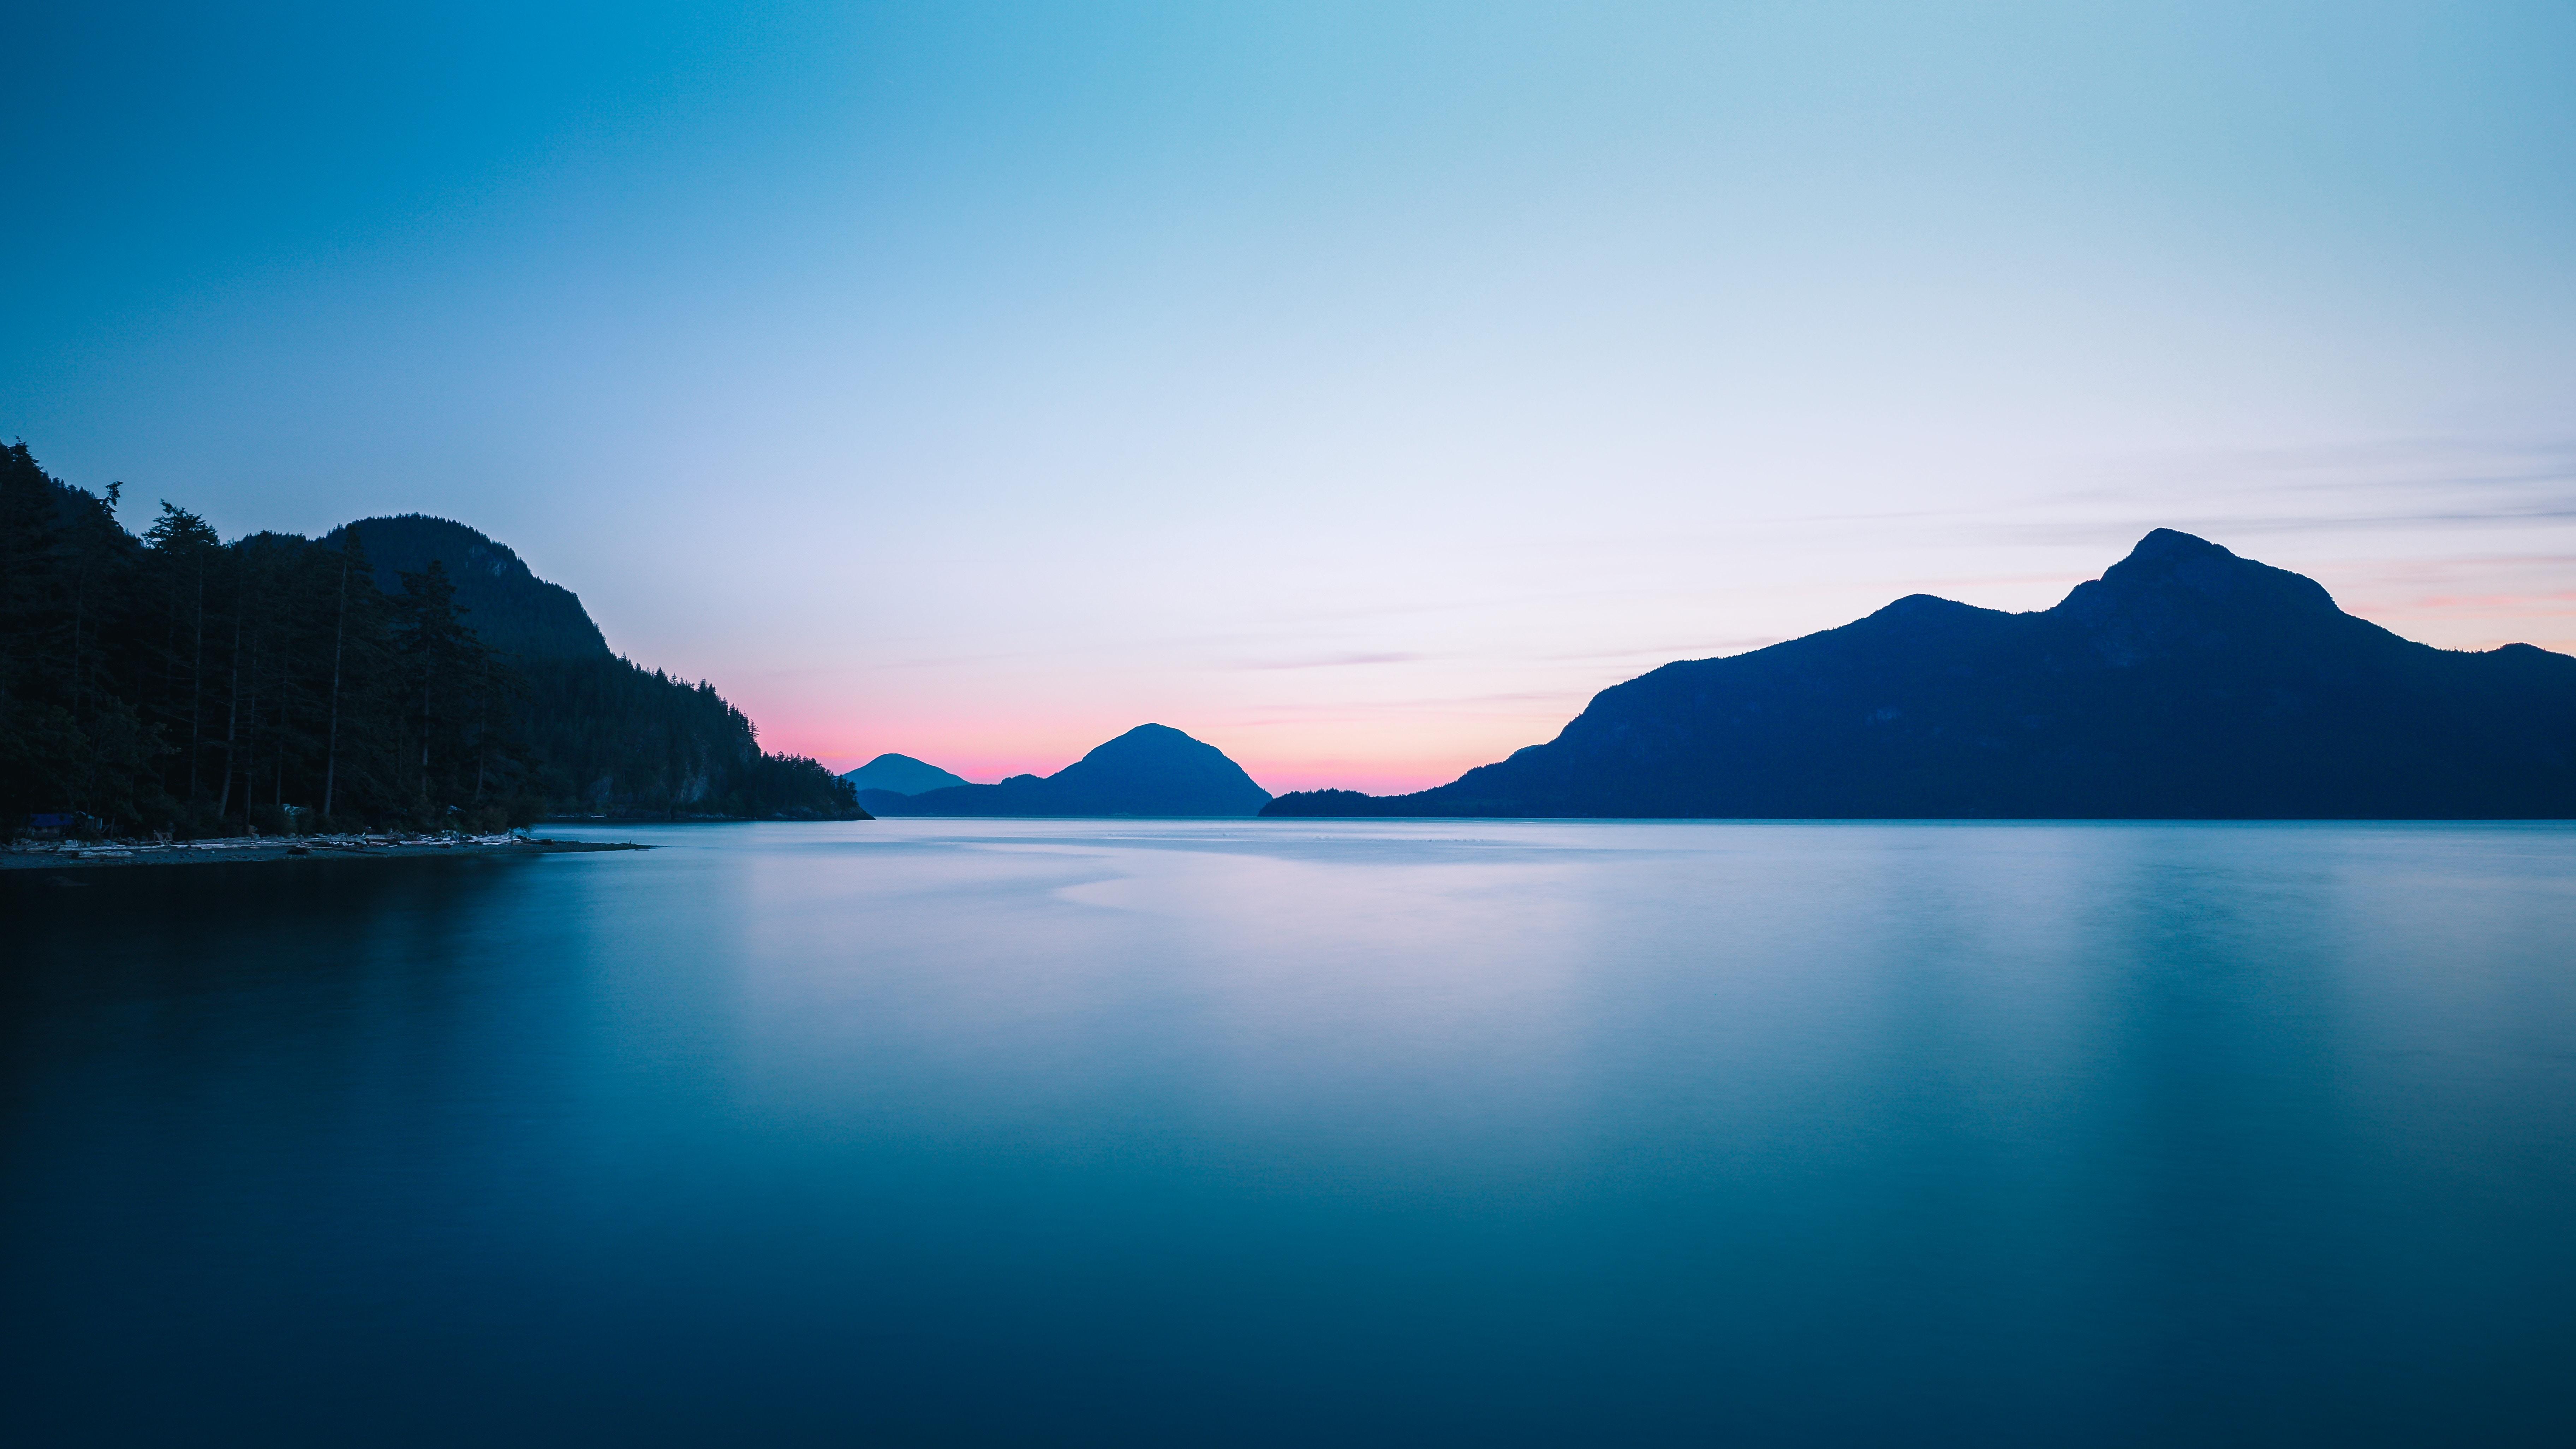 silhouette photo of mountain range near body of water